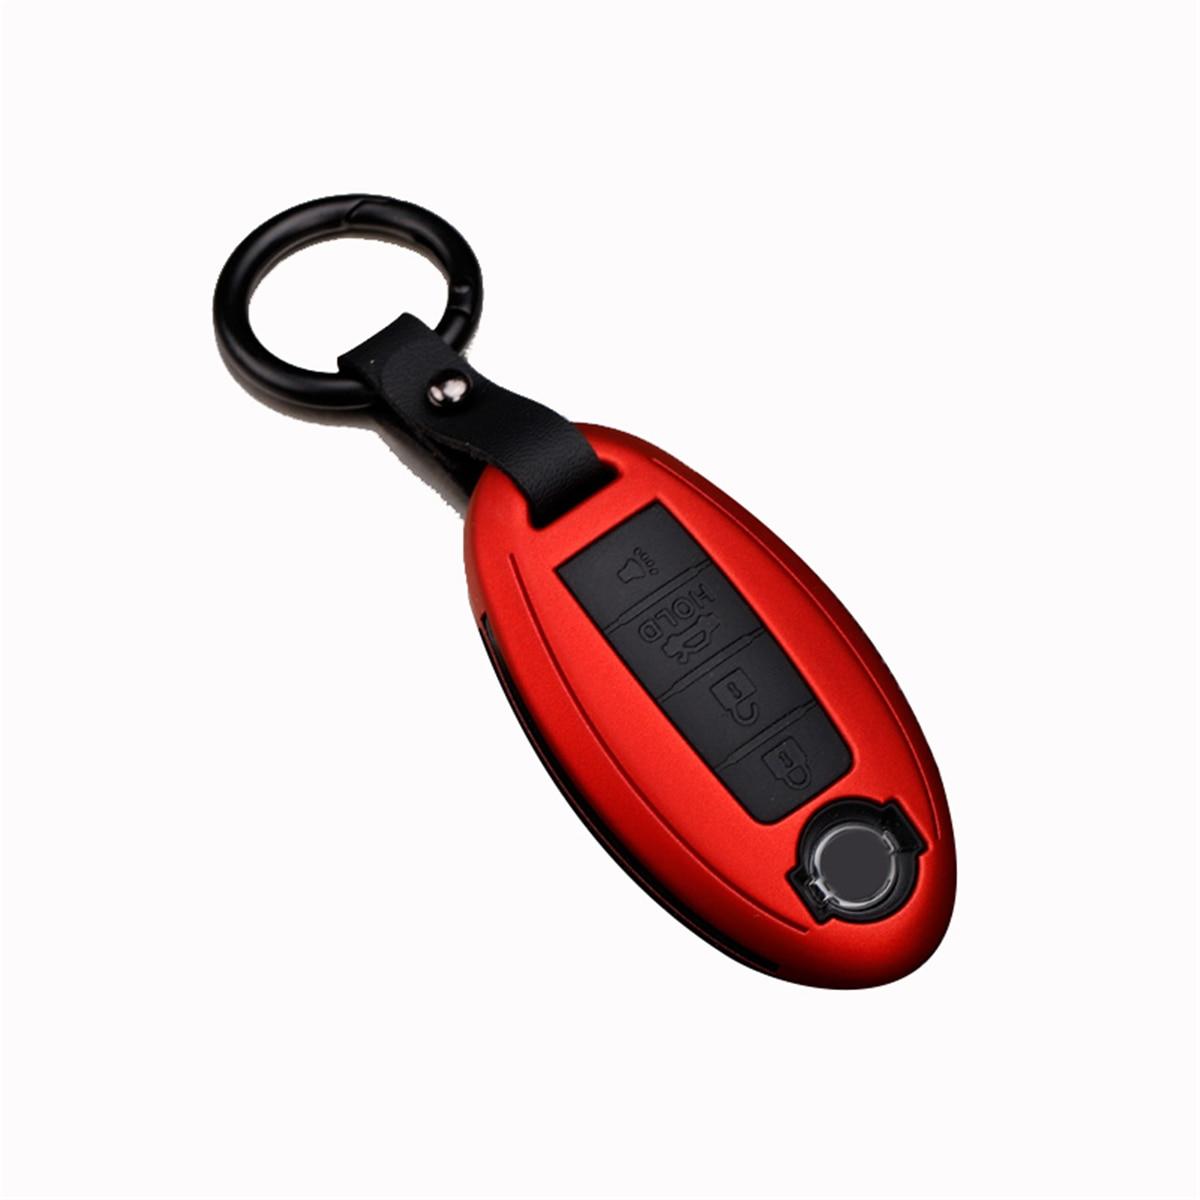 Llavero inteligente para coche de 4 botones con llave plegable con control remoto, estuche protector, llavero protector para NISSAN LIVINA SYLPHY SUNNY TEANA MURANO